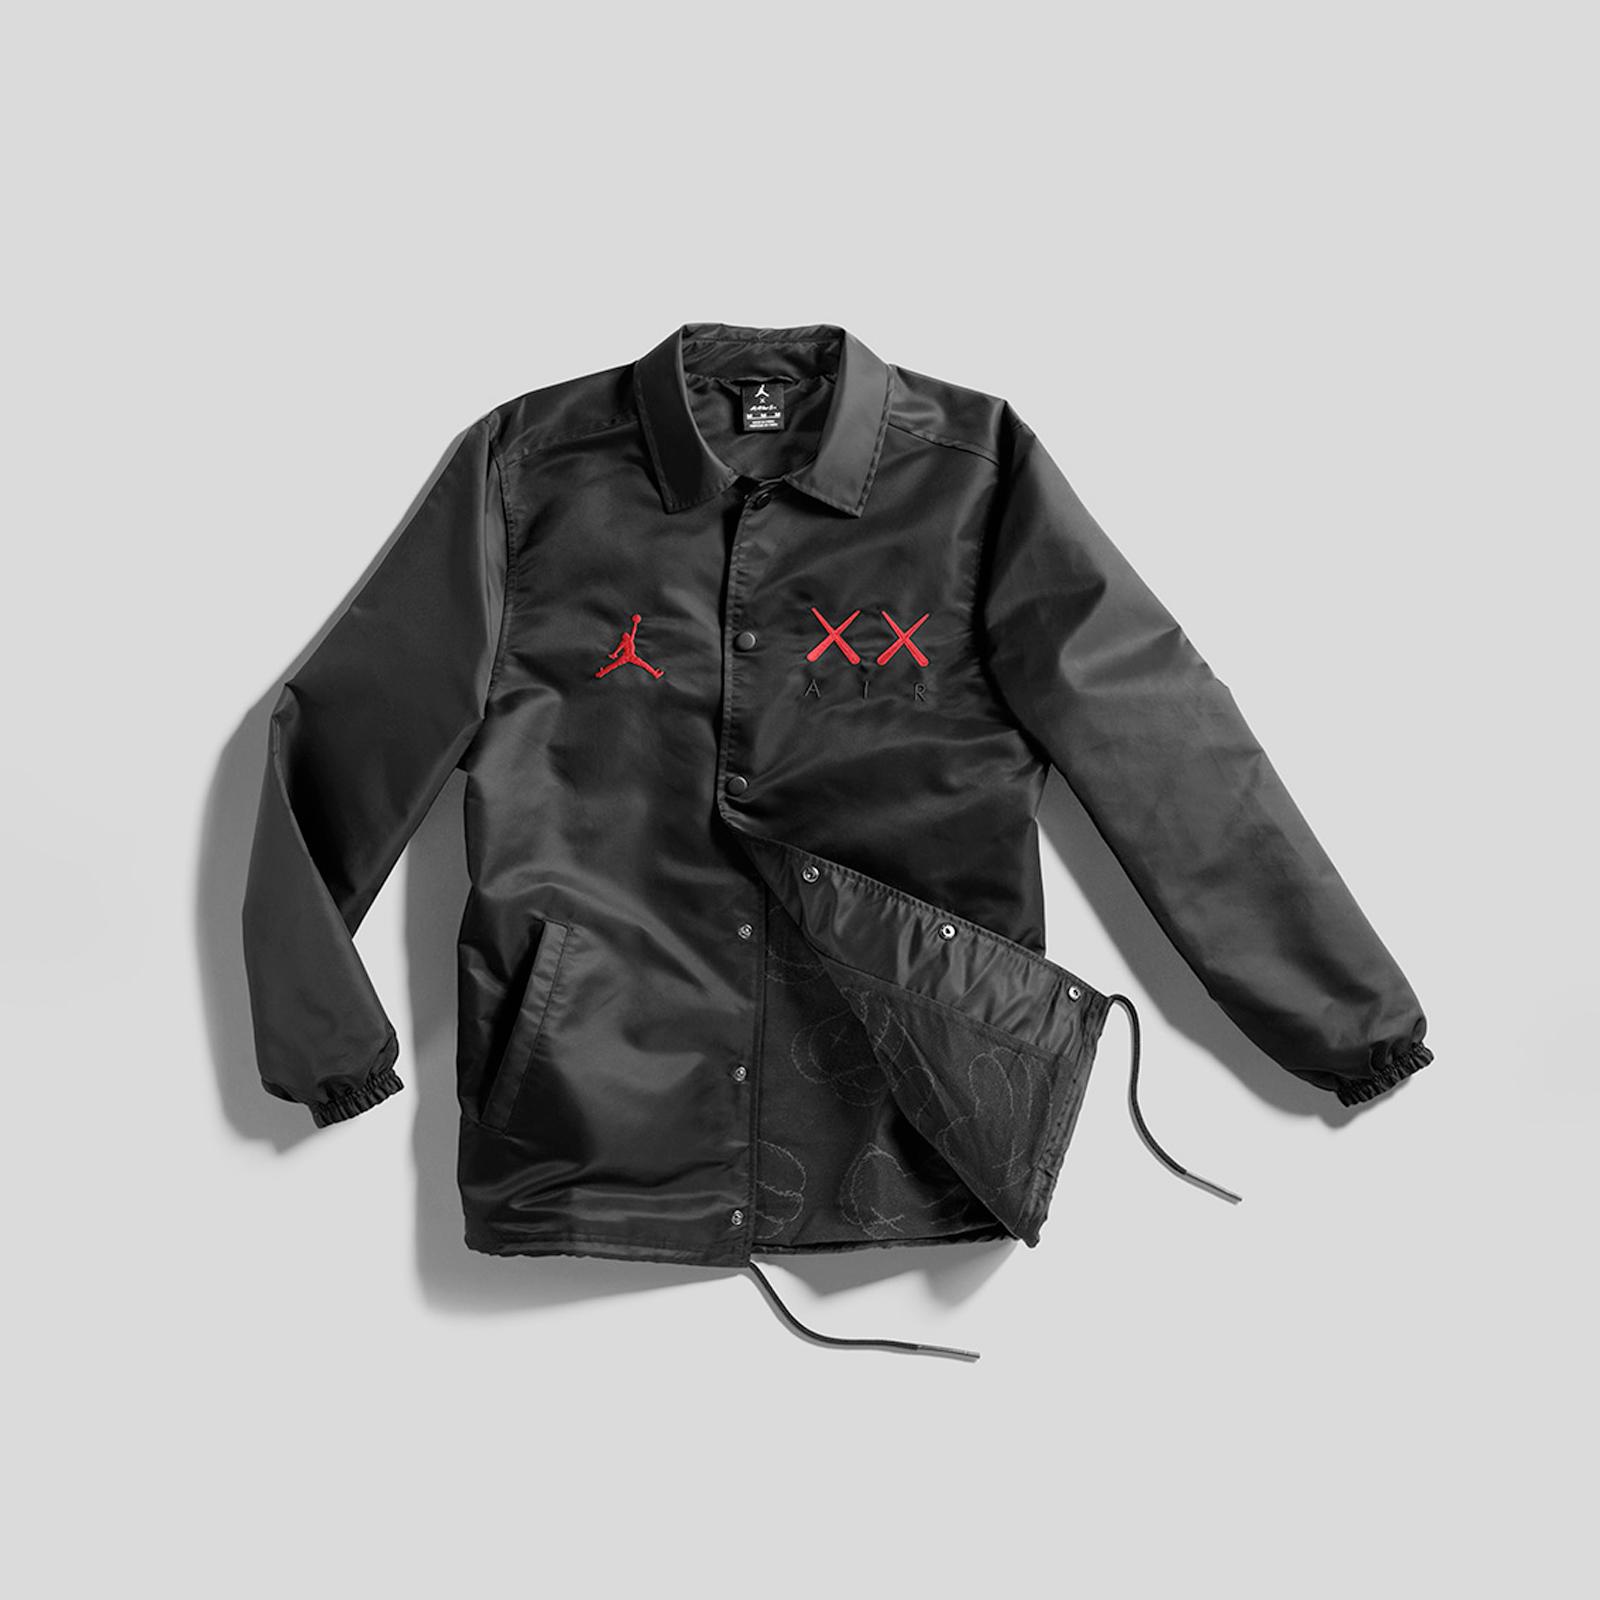 75d21797258f Jordan Brand KAWS Coaches Jacket - 884483-010 - Sneakersnstuff ...